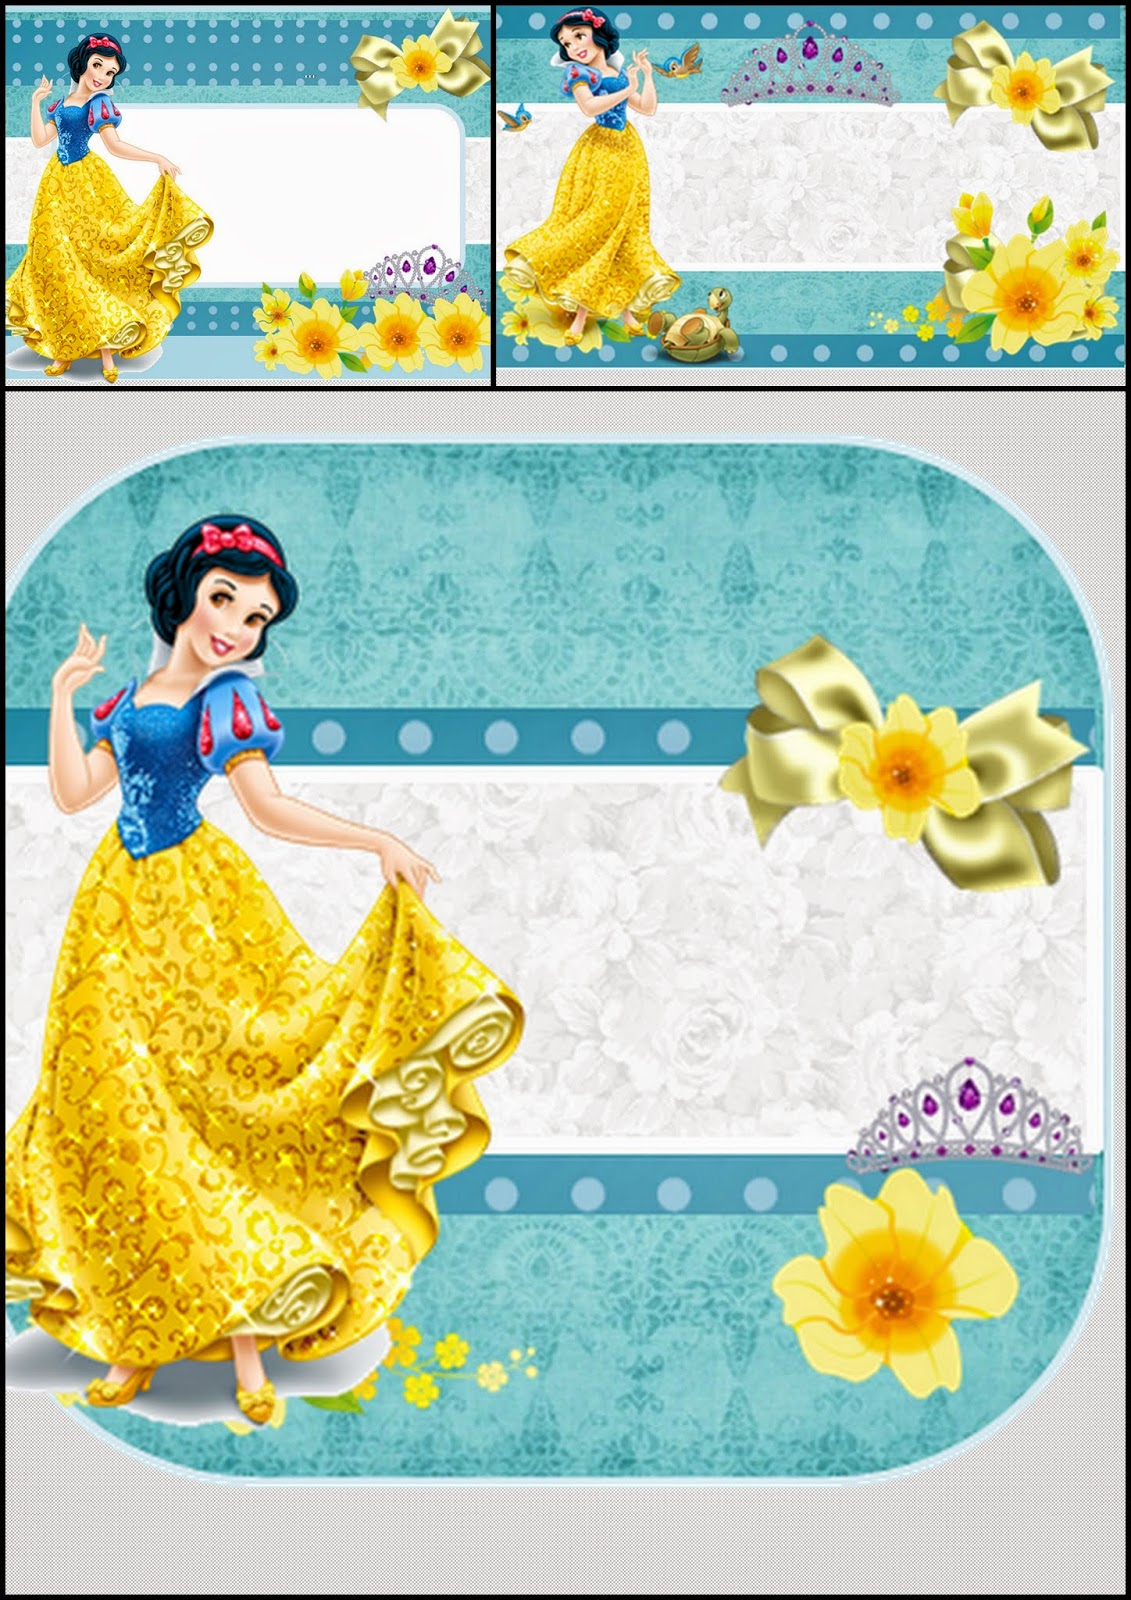 Snow White Free Printable Invitations Or Photo Frames